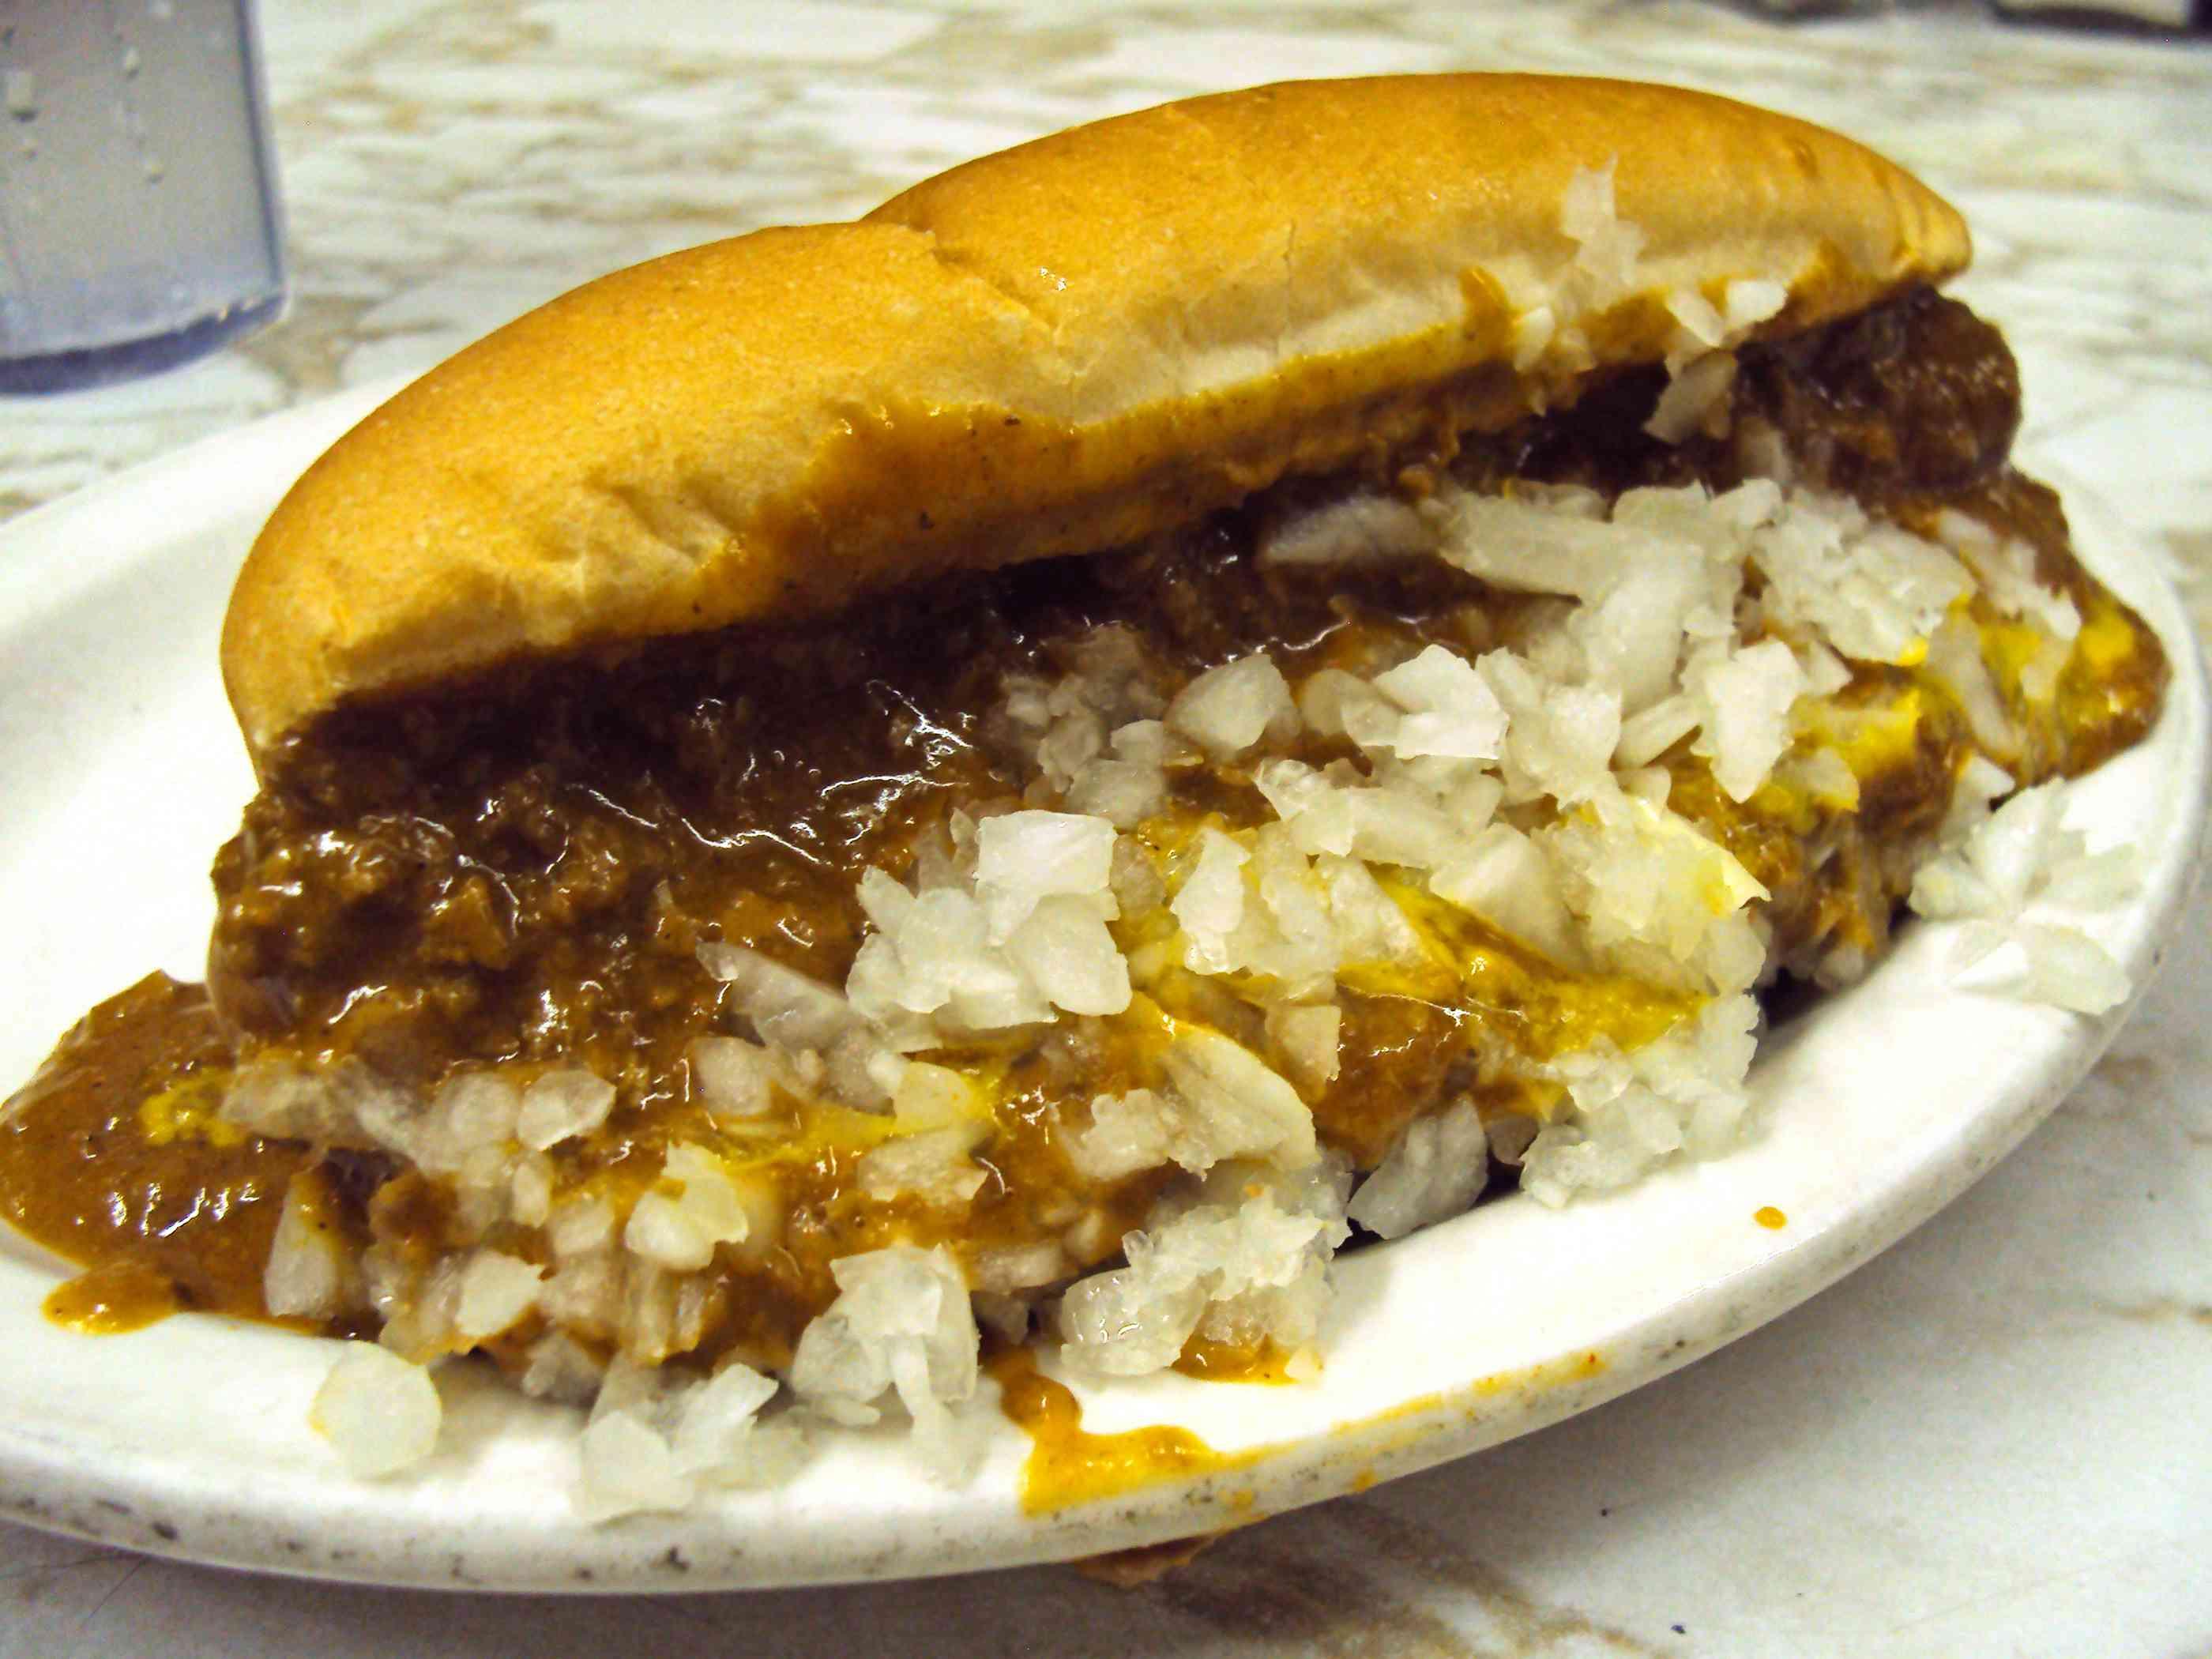 20140701-coney-island-hot-dog-michigan-dulys-coney-dog-detroit-titus-ruscitti.JPG